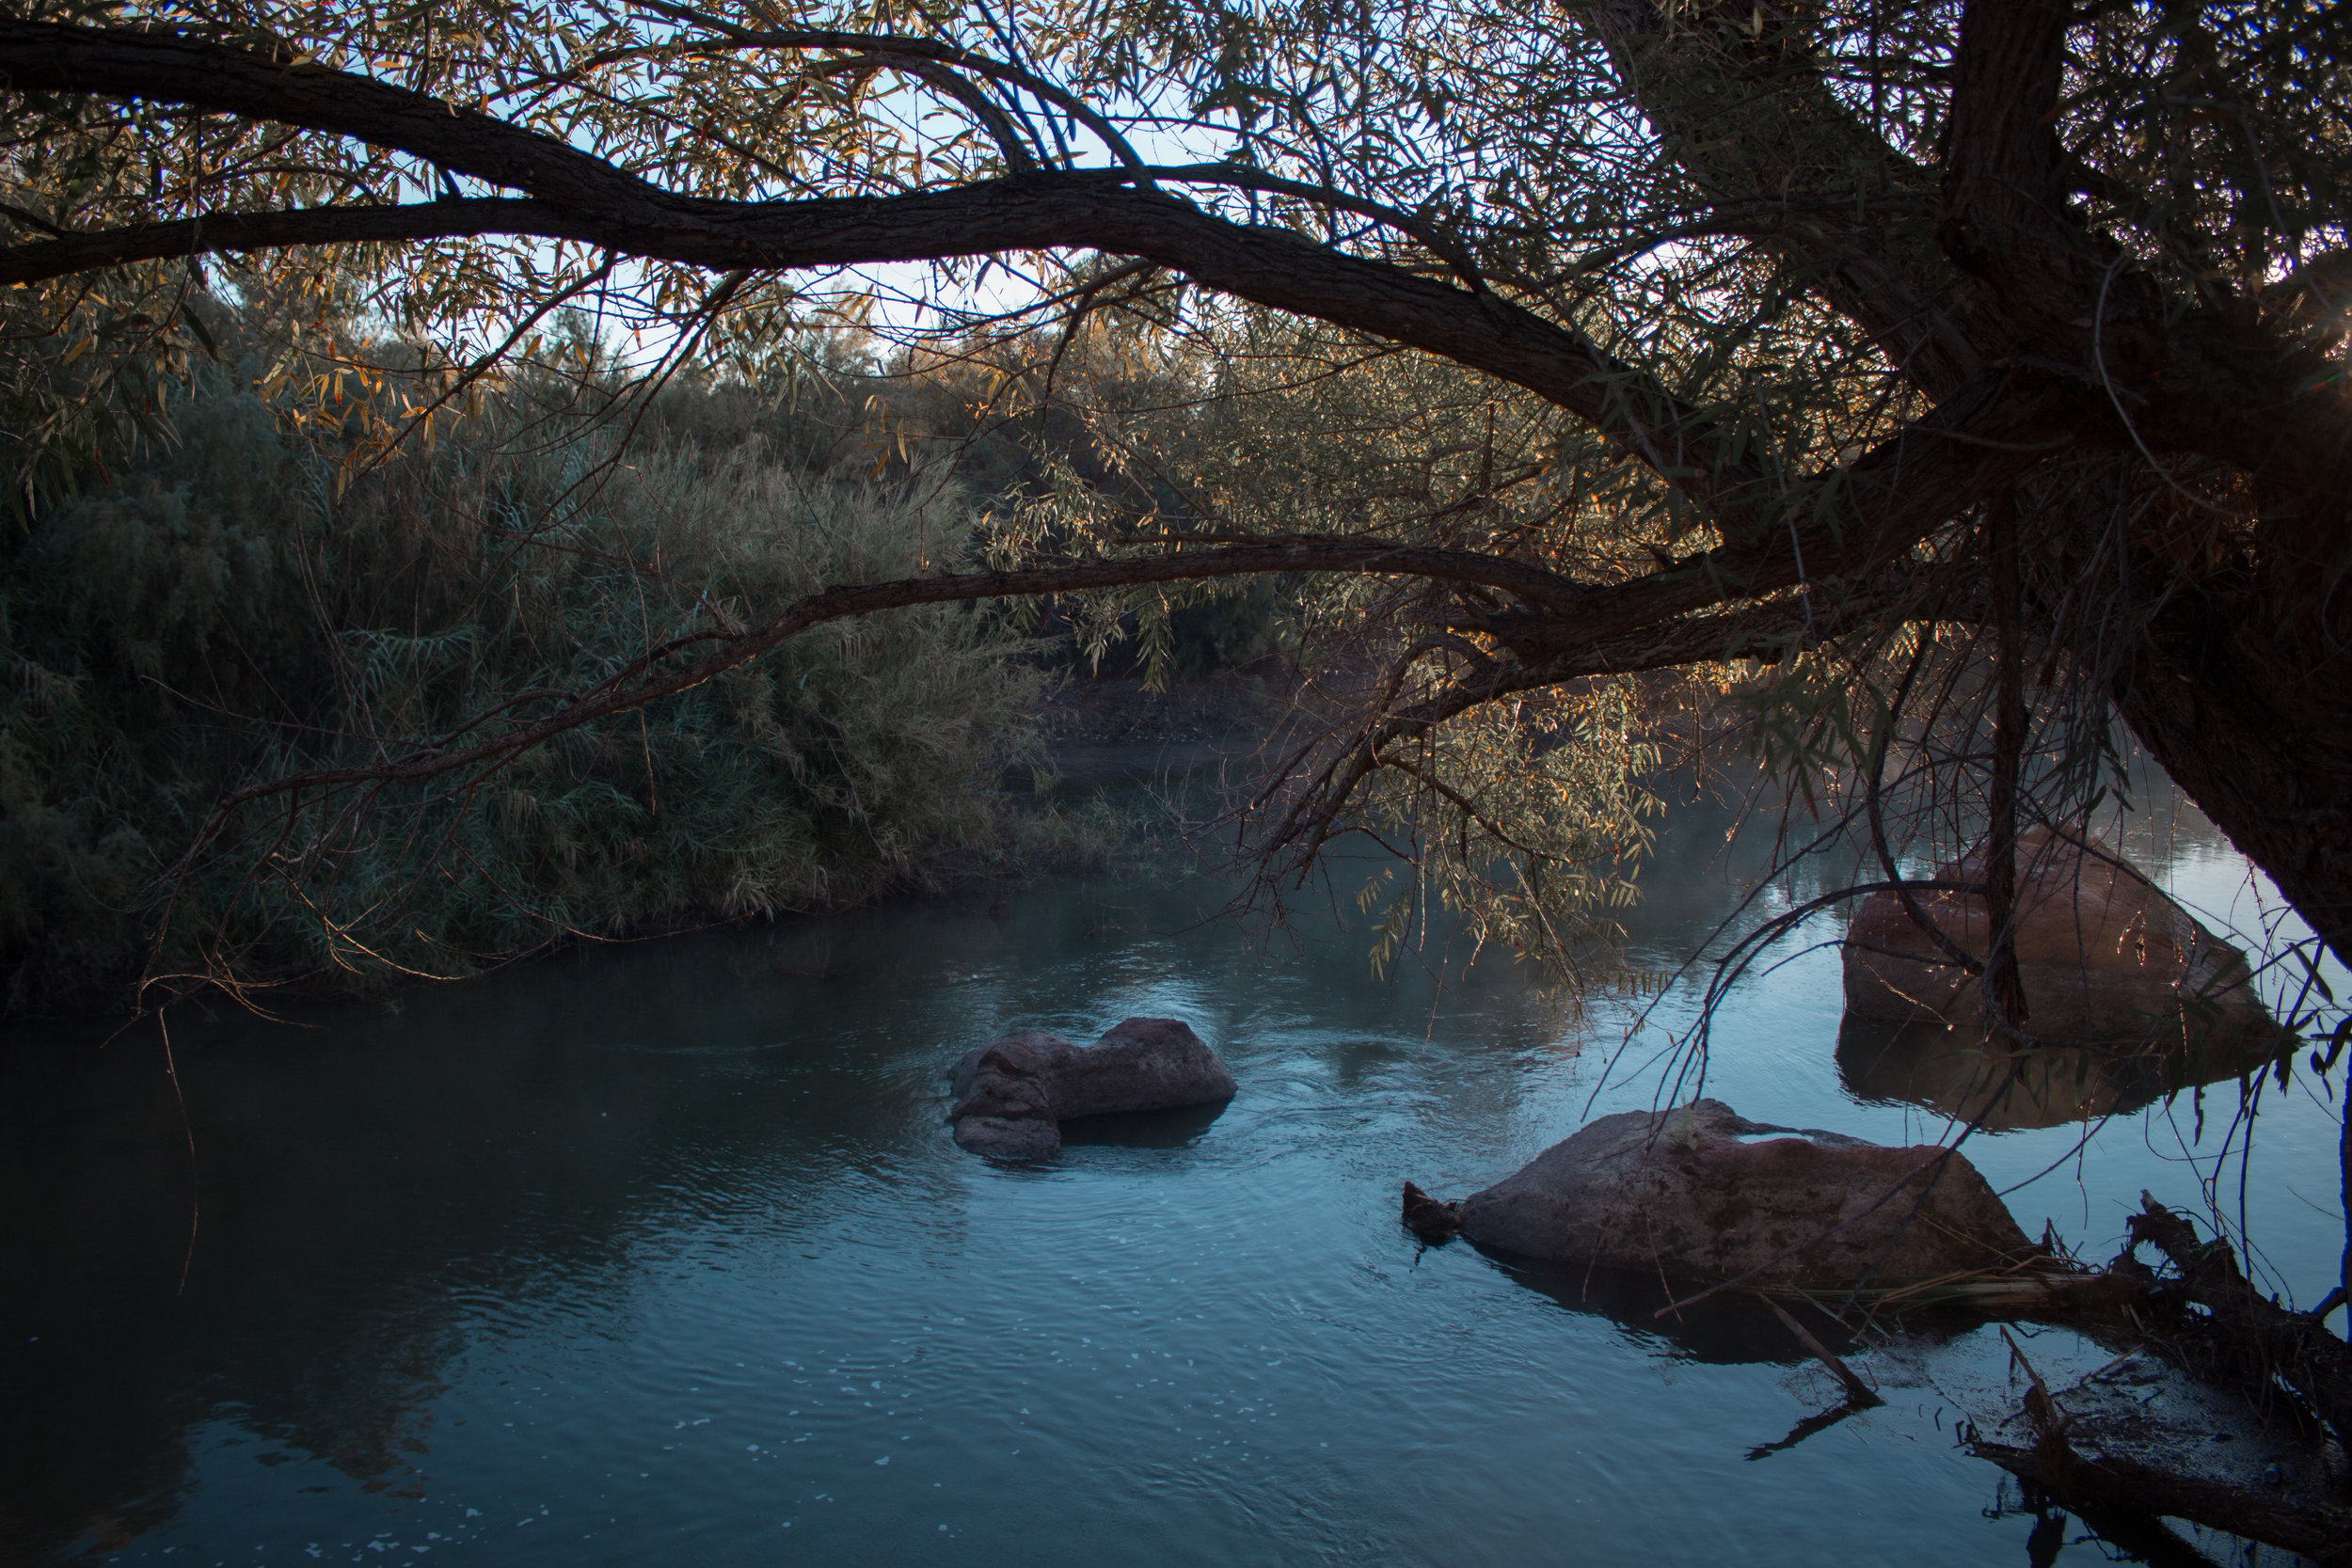 riverfog-8623.jpg